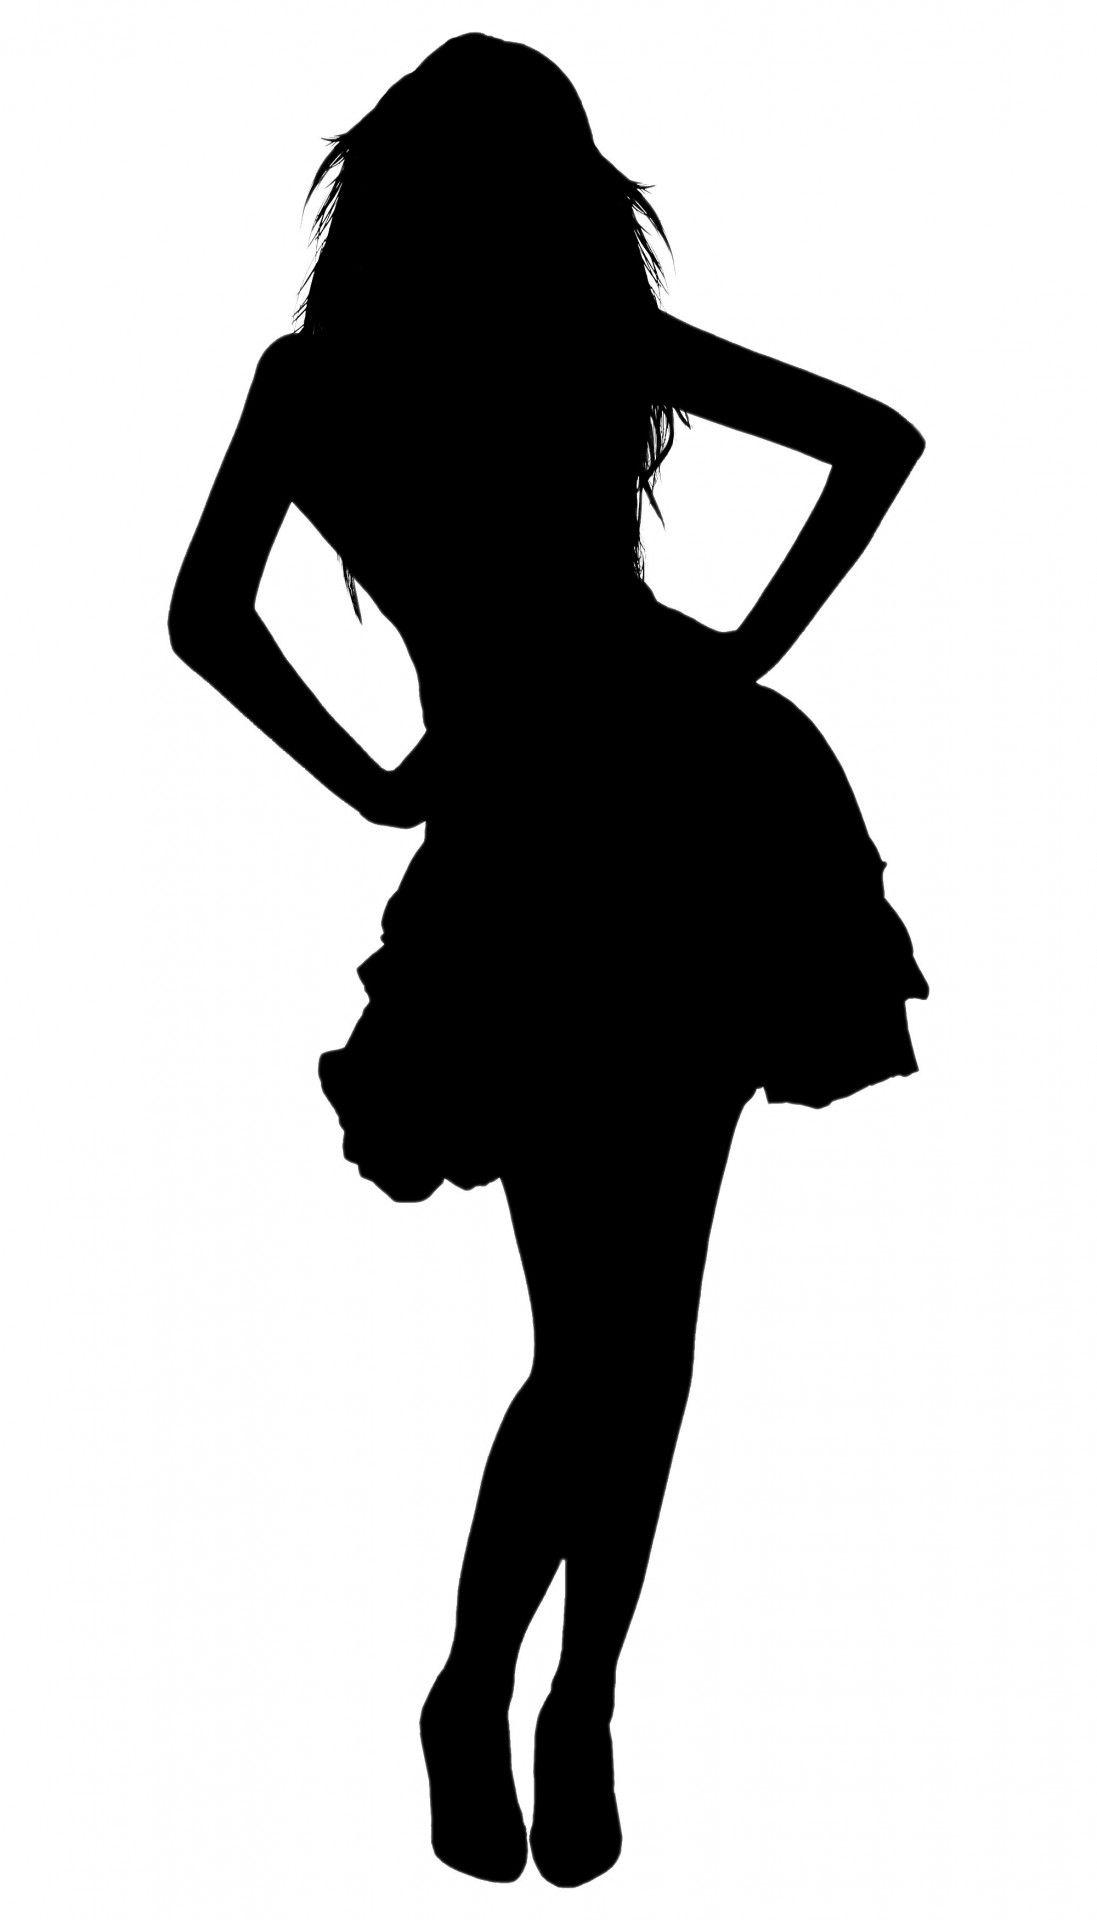 Silhouette Woman 2